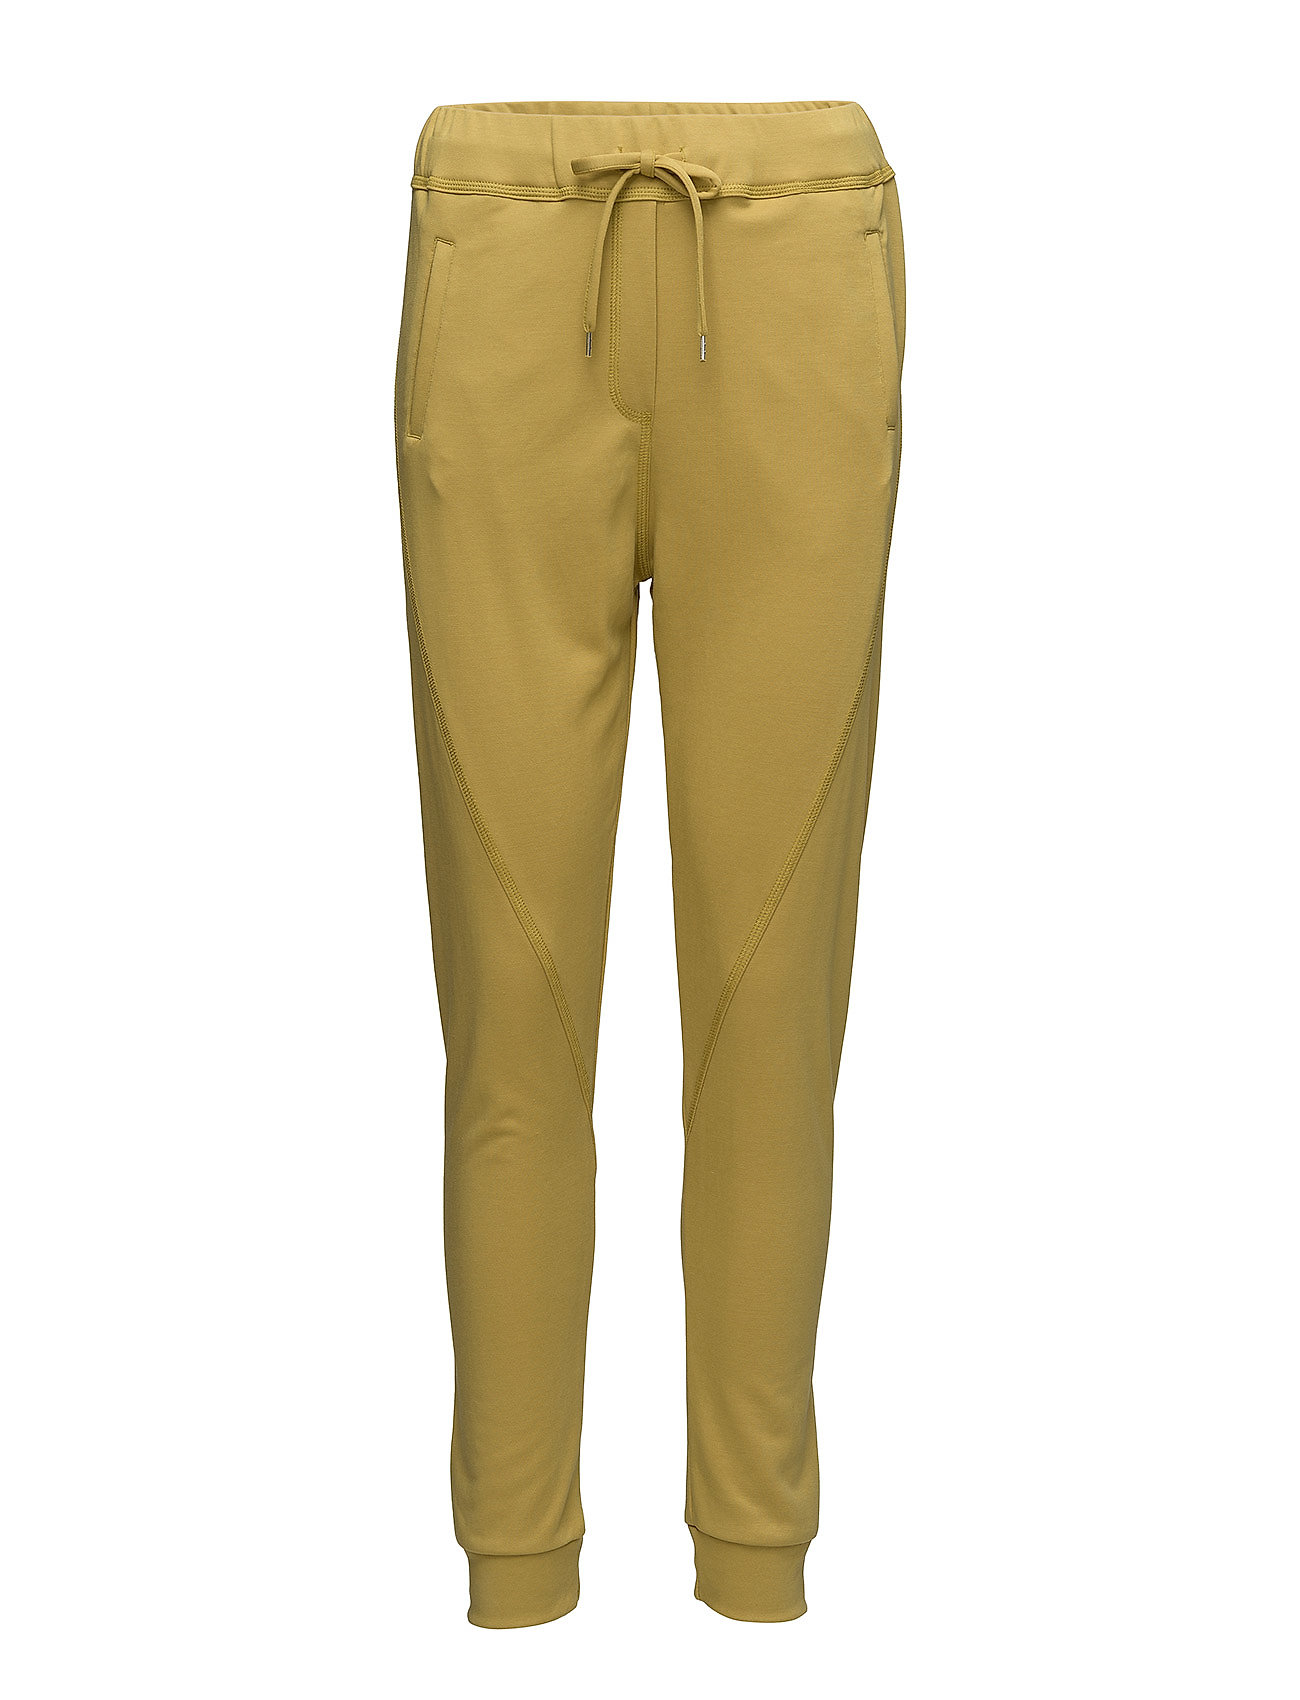 f9a69e5e3070 Handla kläder och mode från 2nd One online: Solange 833 Raw Stone ...